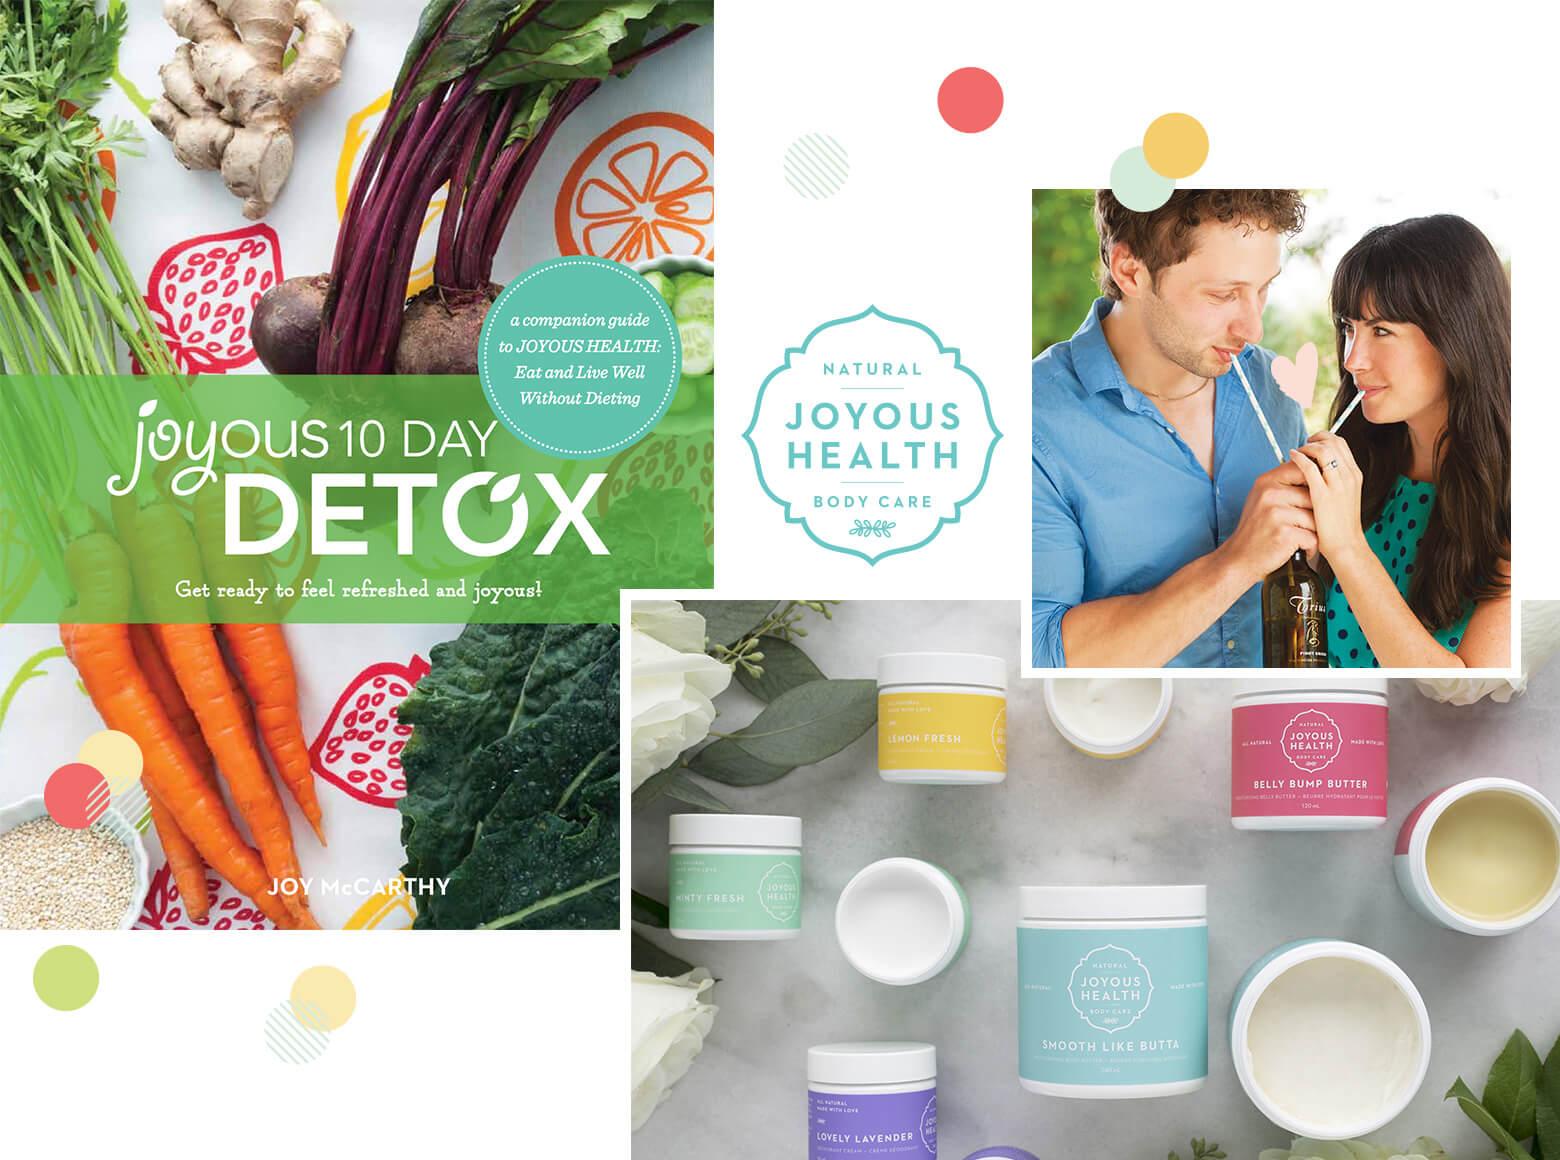 joyous health 10 day detox pdf